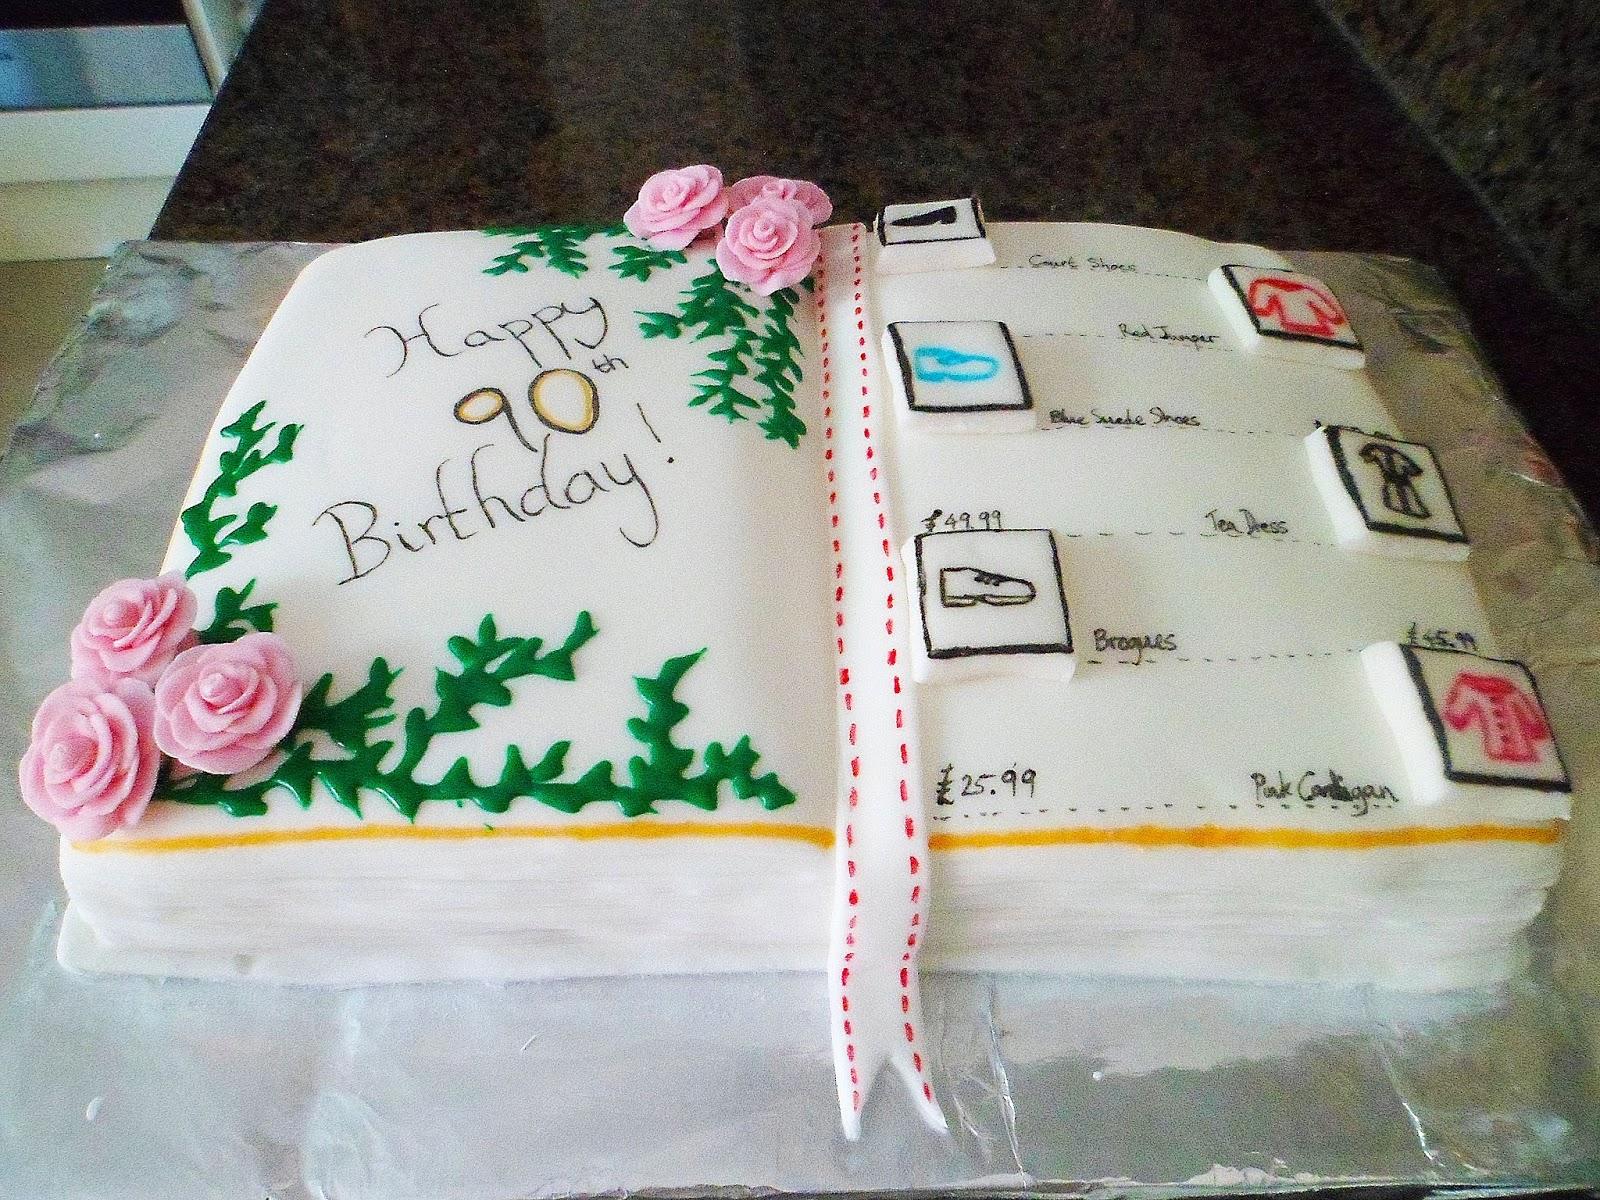 Magnificent Catalogue Cake Grandmas 90Th Birthday Personalised Birthday Cards Paralily Jamesorg